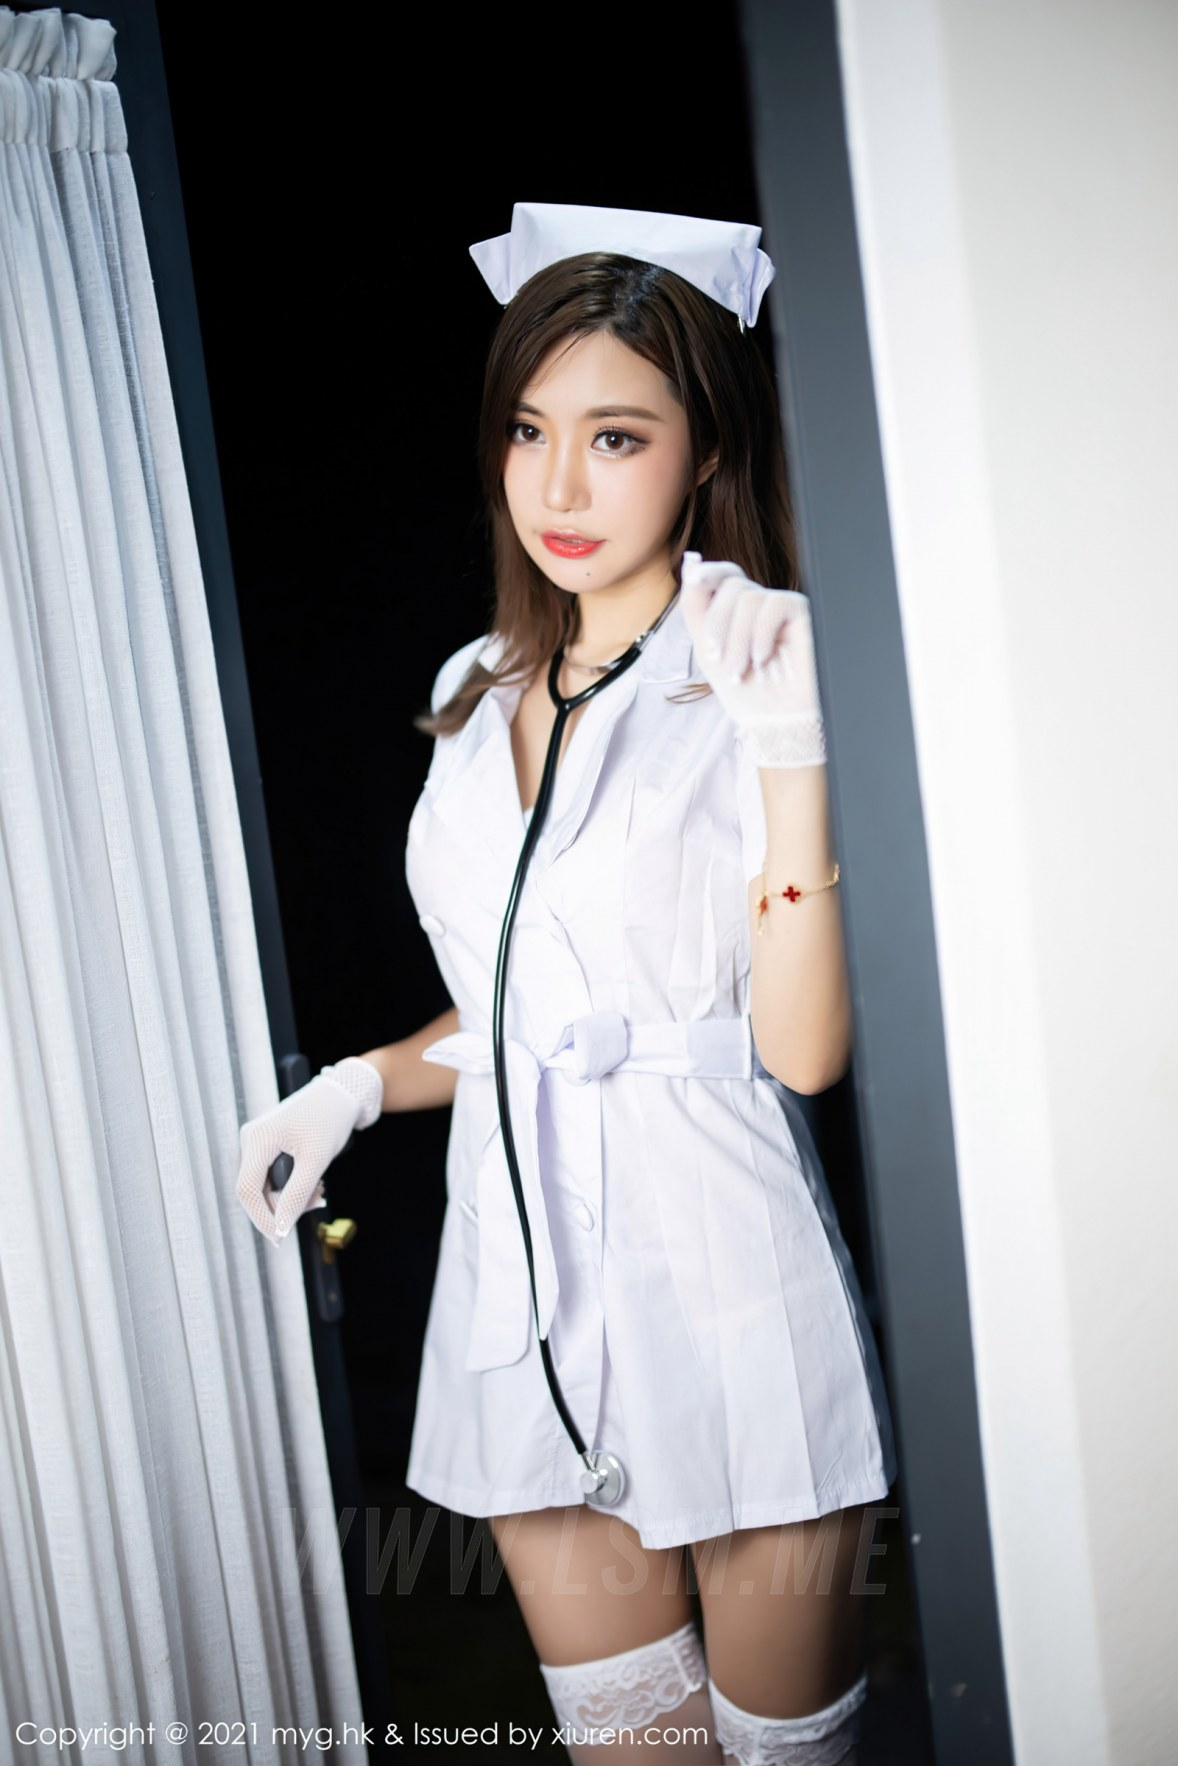 MyGirl 美媛馆 Vol.578 护士制服主题 绮里嘉Carina 杭州旅拍111 - 1